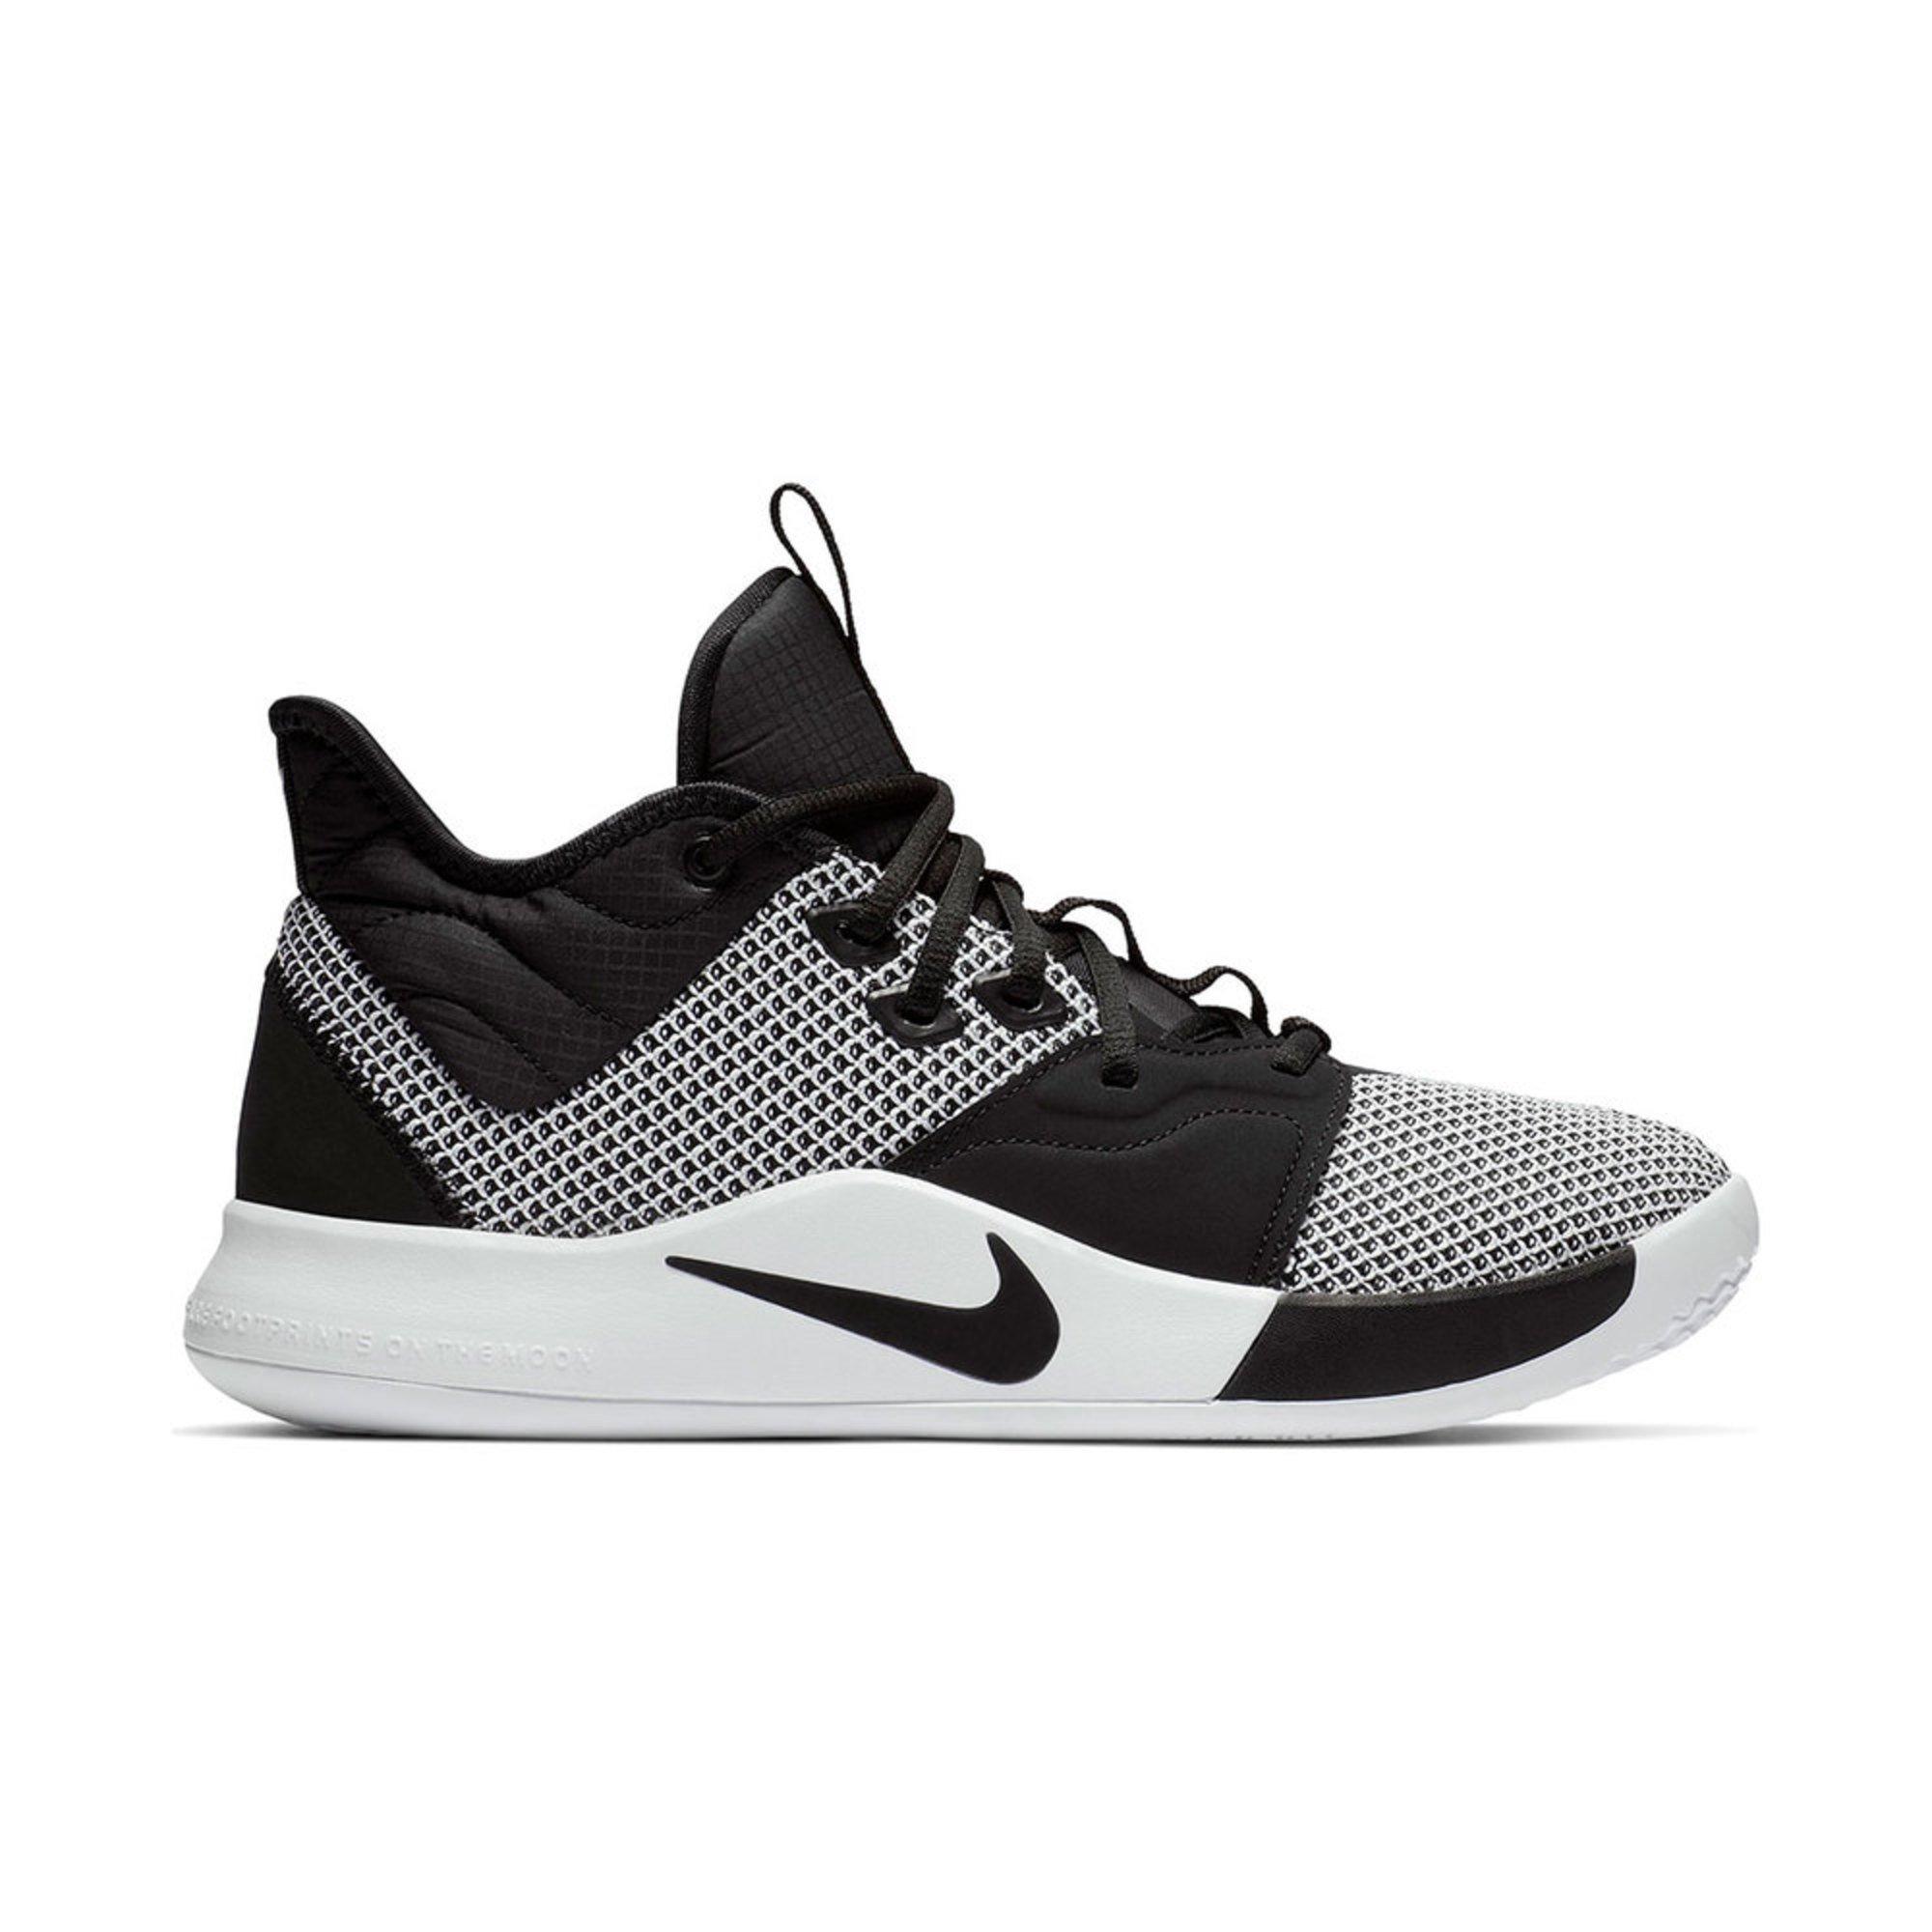 new arrivals 23a5d b52b4 Nike Men's Pg 3 Basketball Shoe | Men's Basketball Shoes ...